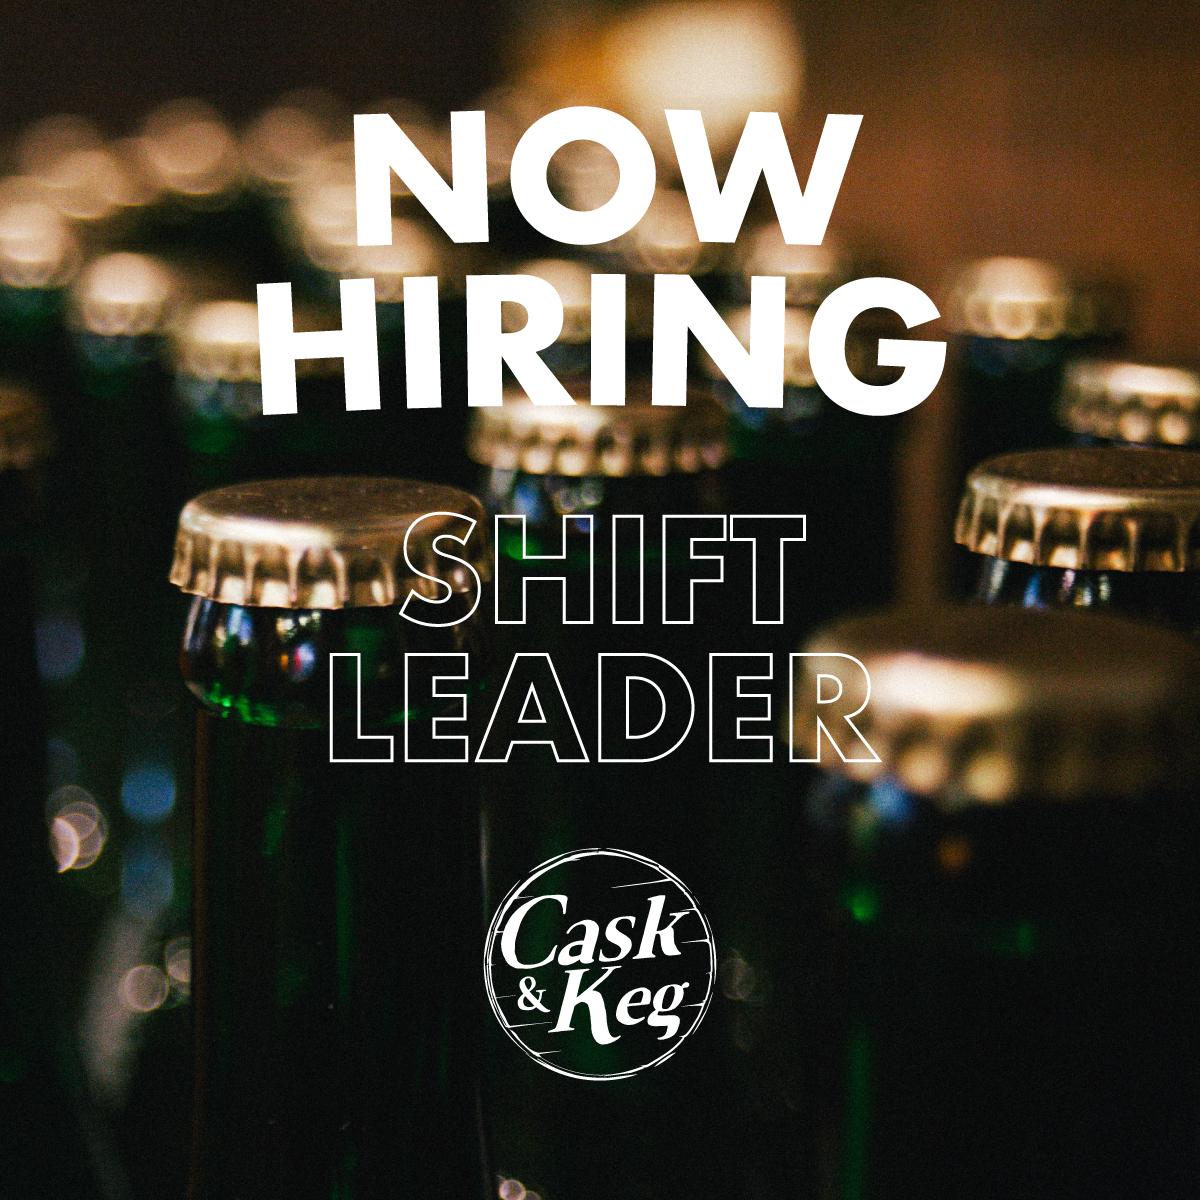 Shift leader cask keg